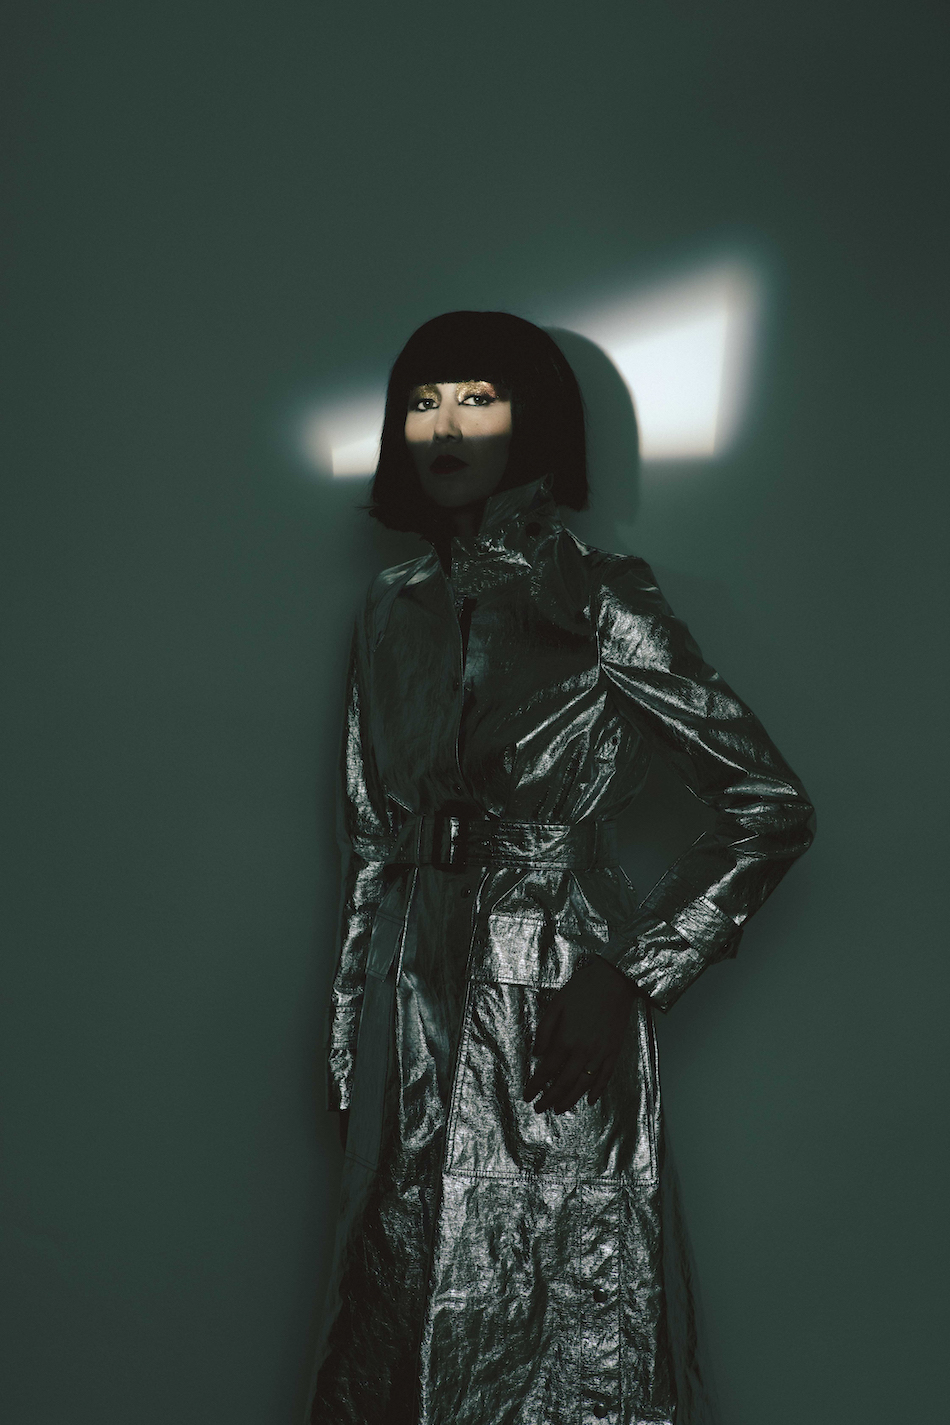 Karen O © Eliot Lee Hazel